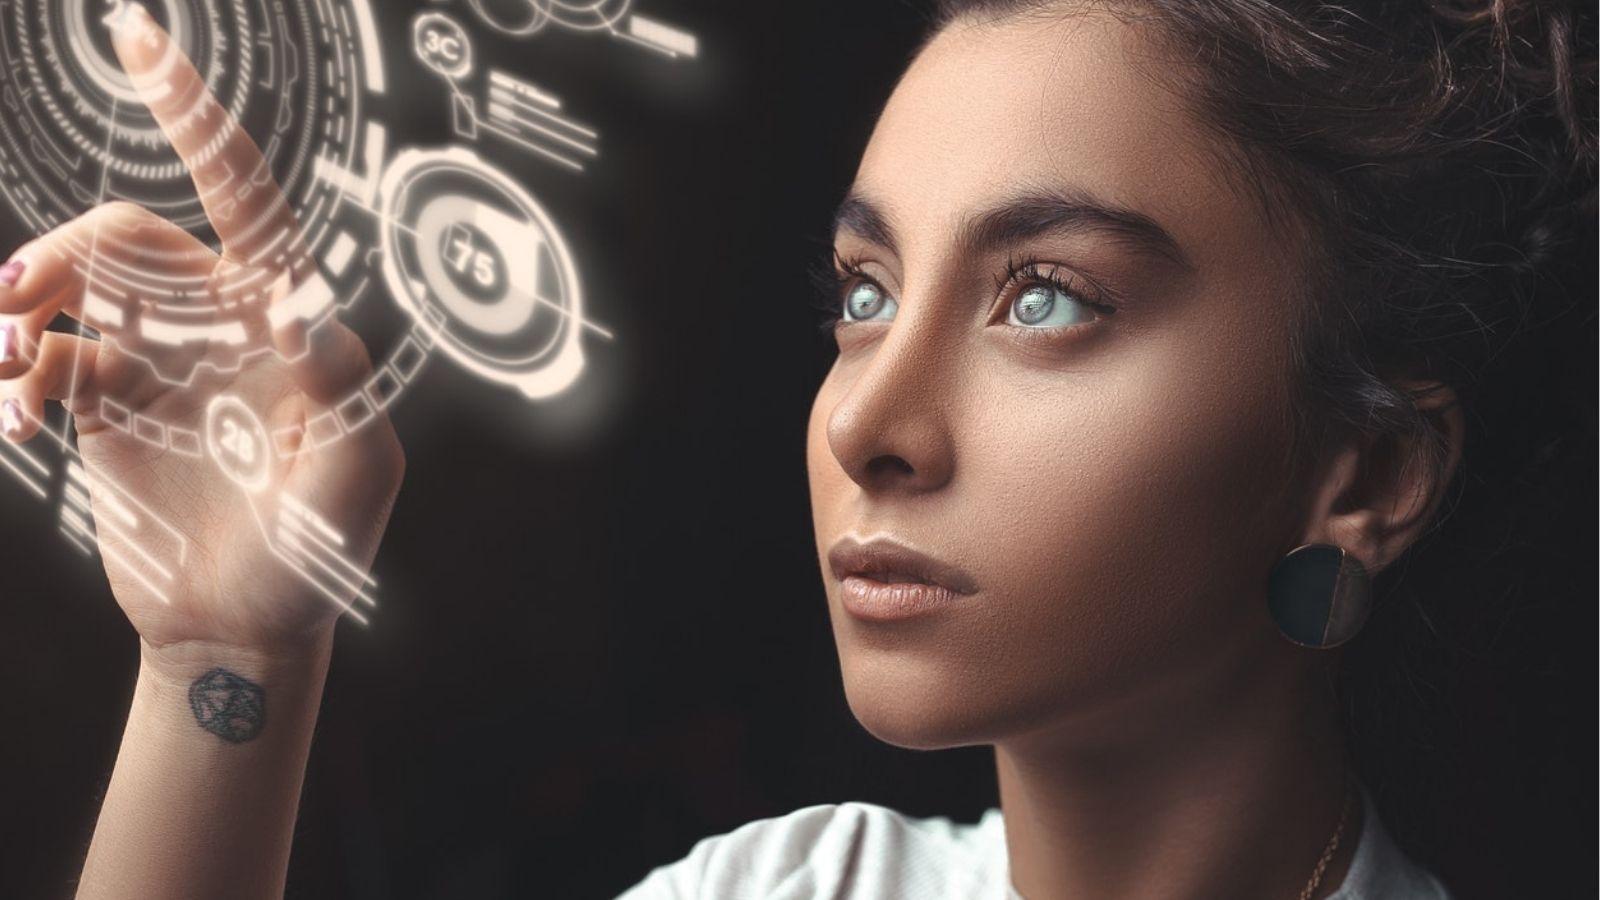 Woman Touching Tech Image